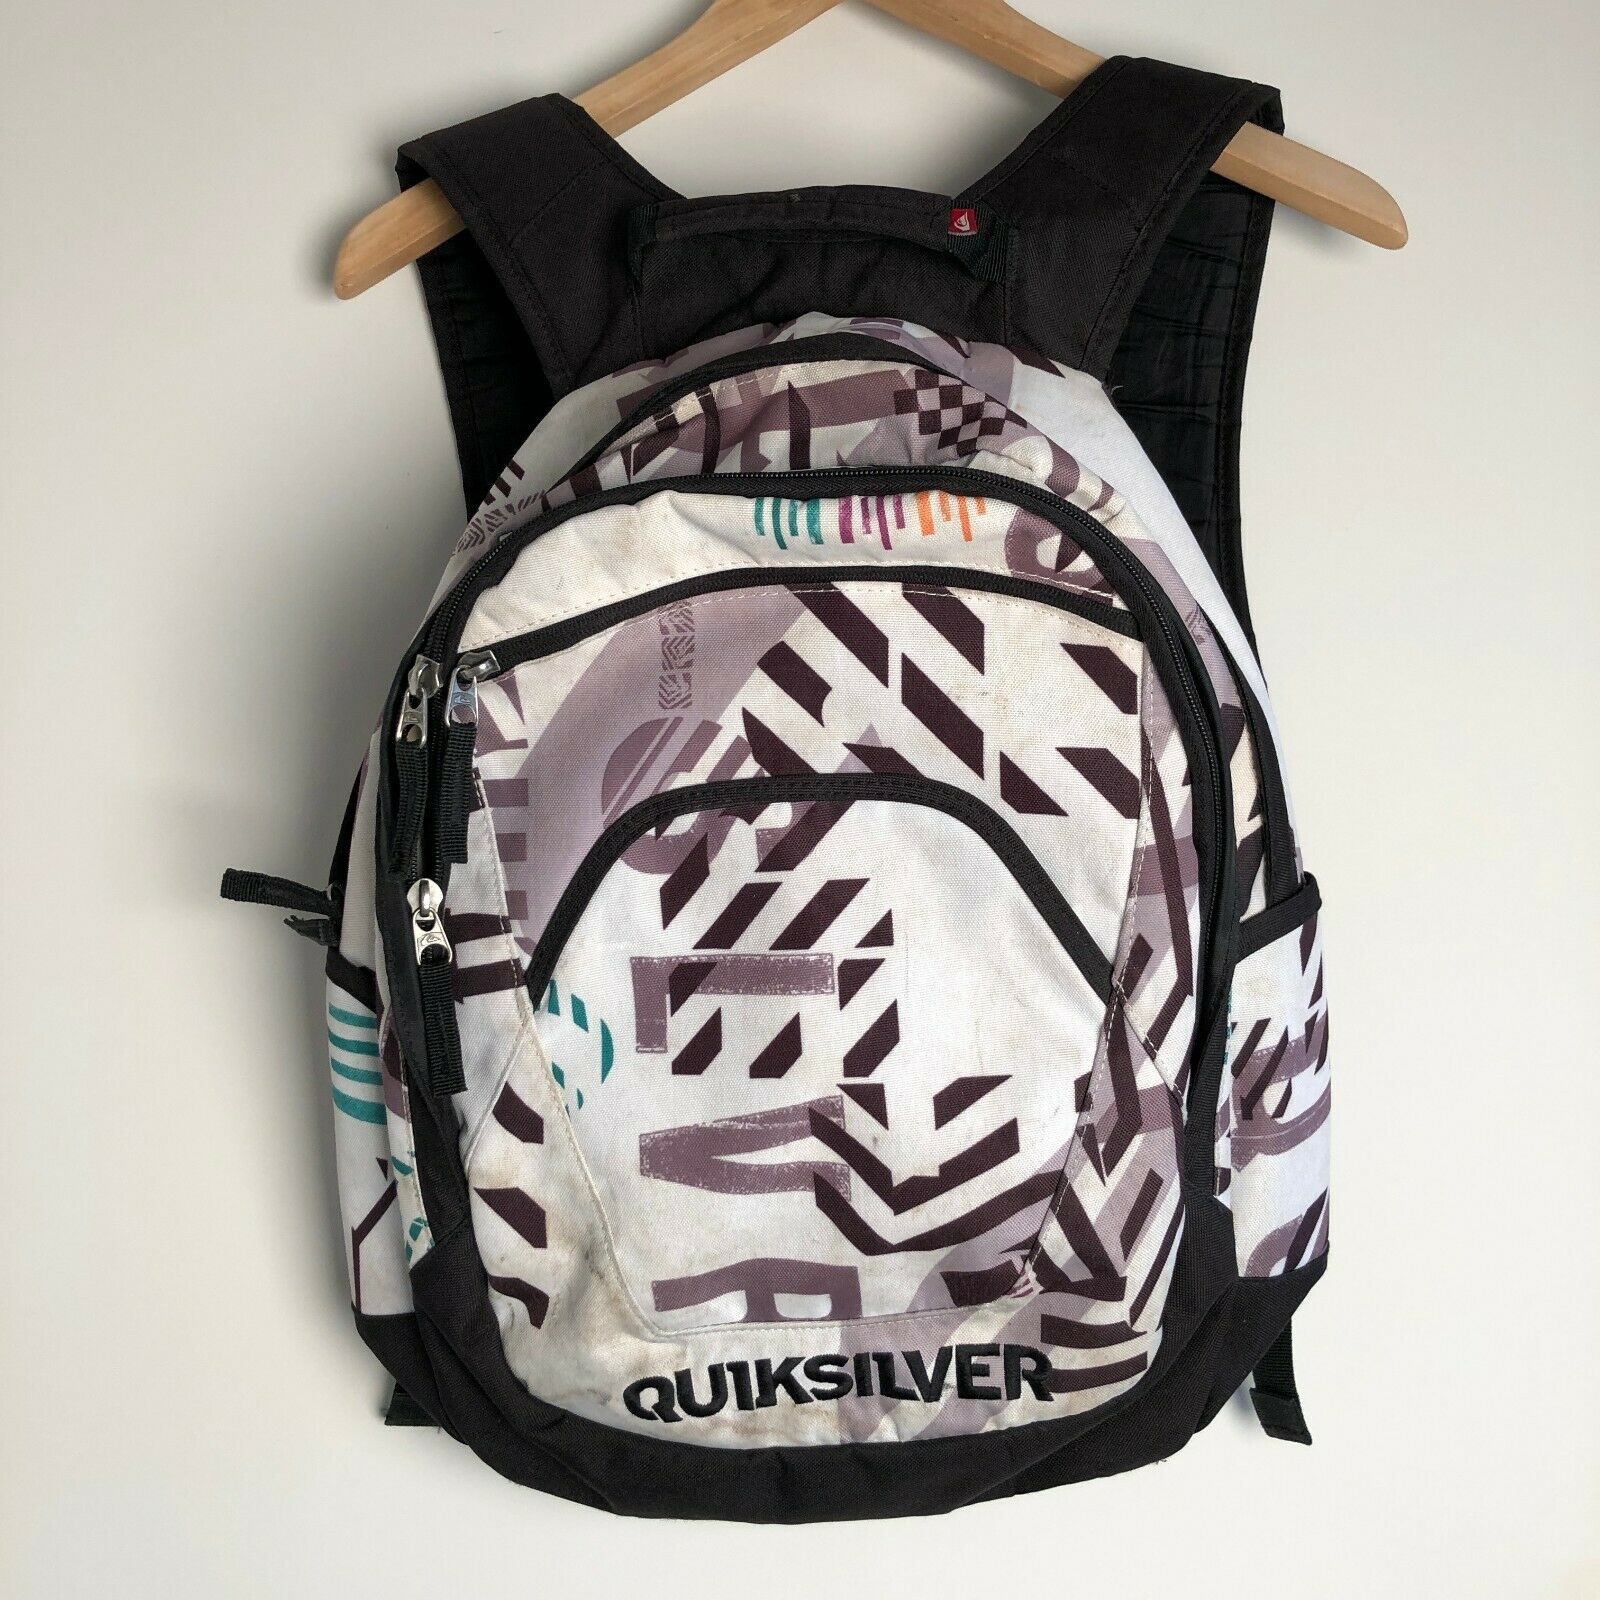 Quiksilver White Graphic Rucksack Backpack School Walking